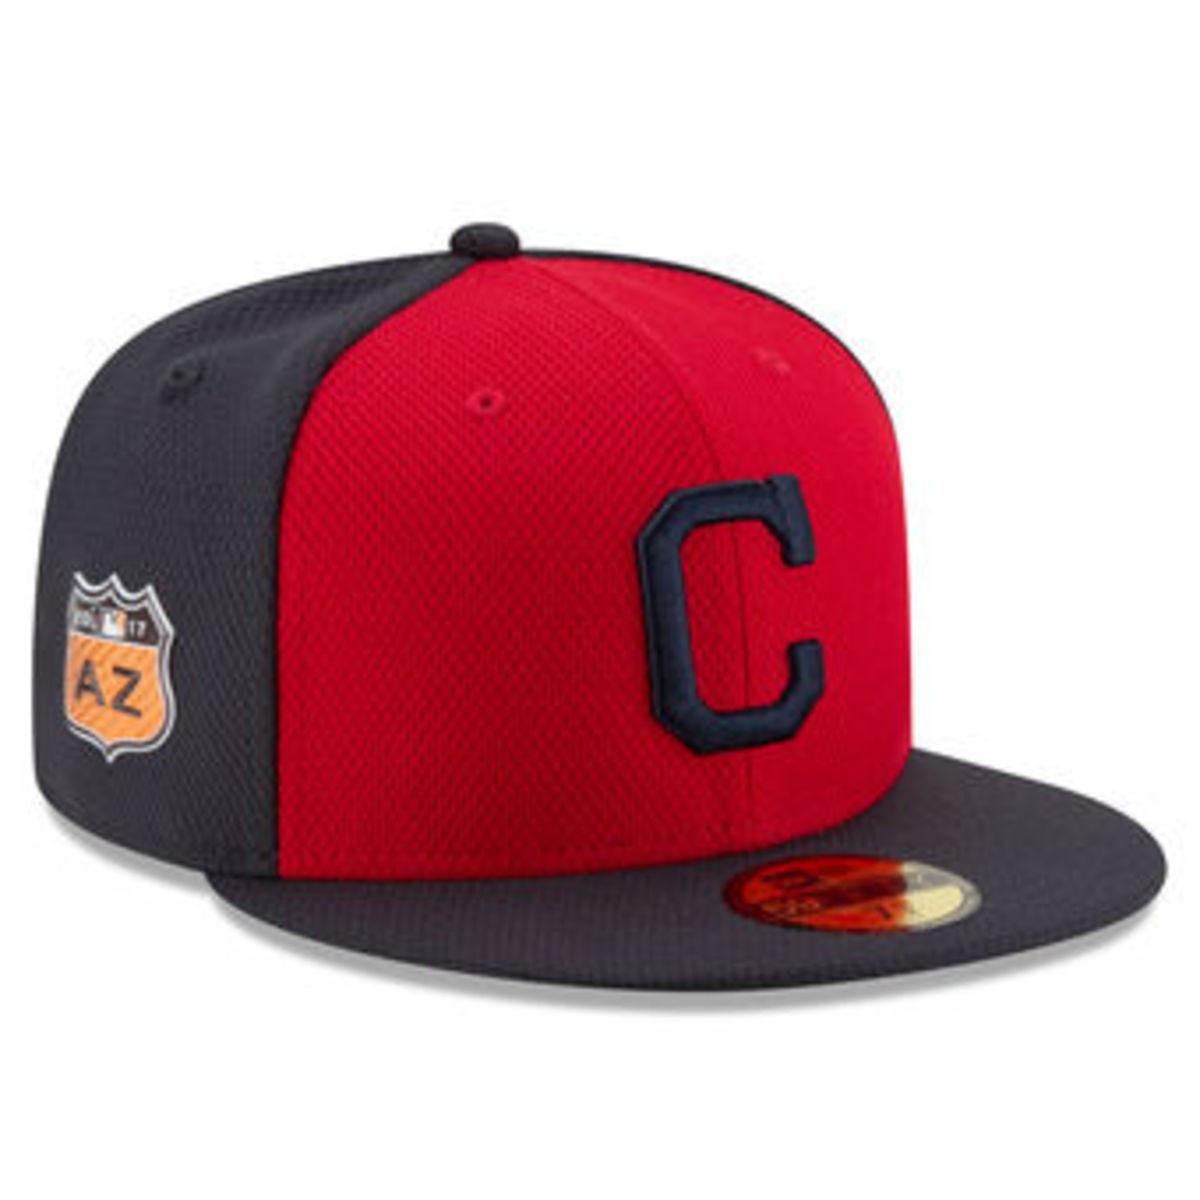 indians-spring-training-hat.jpg